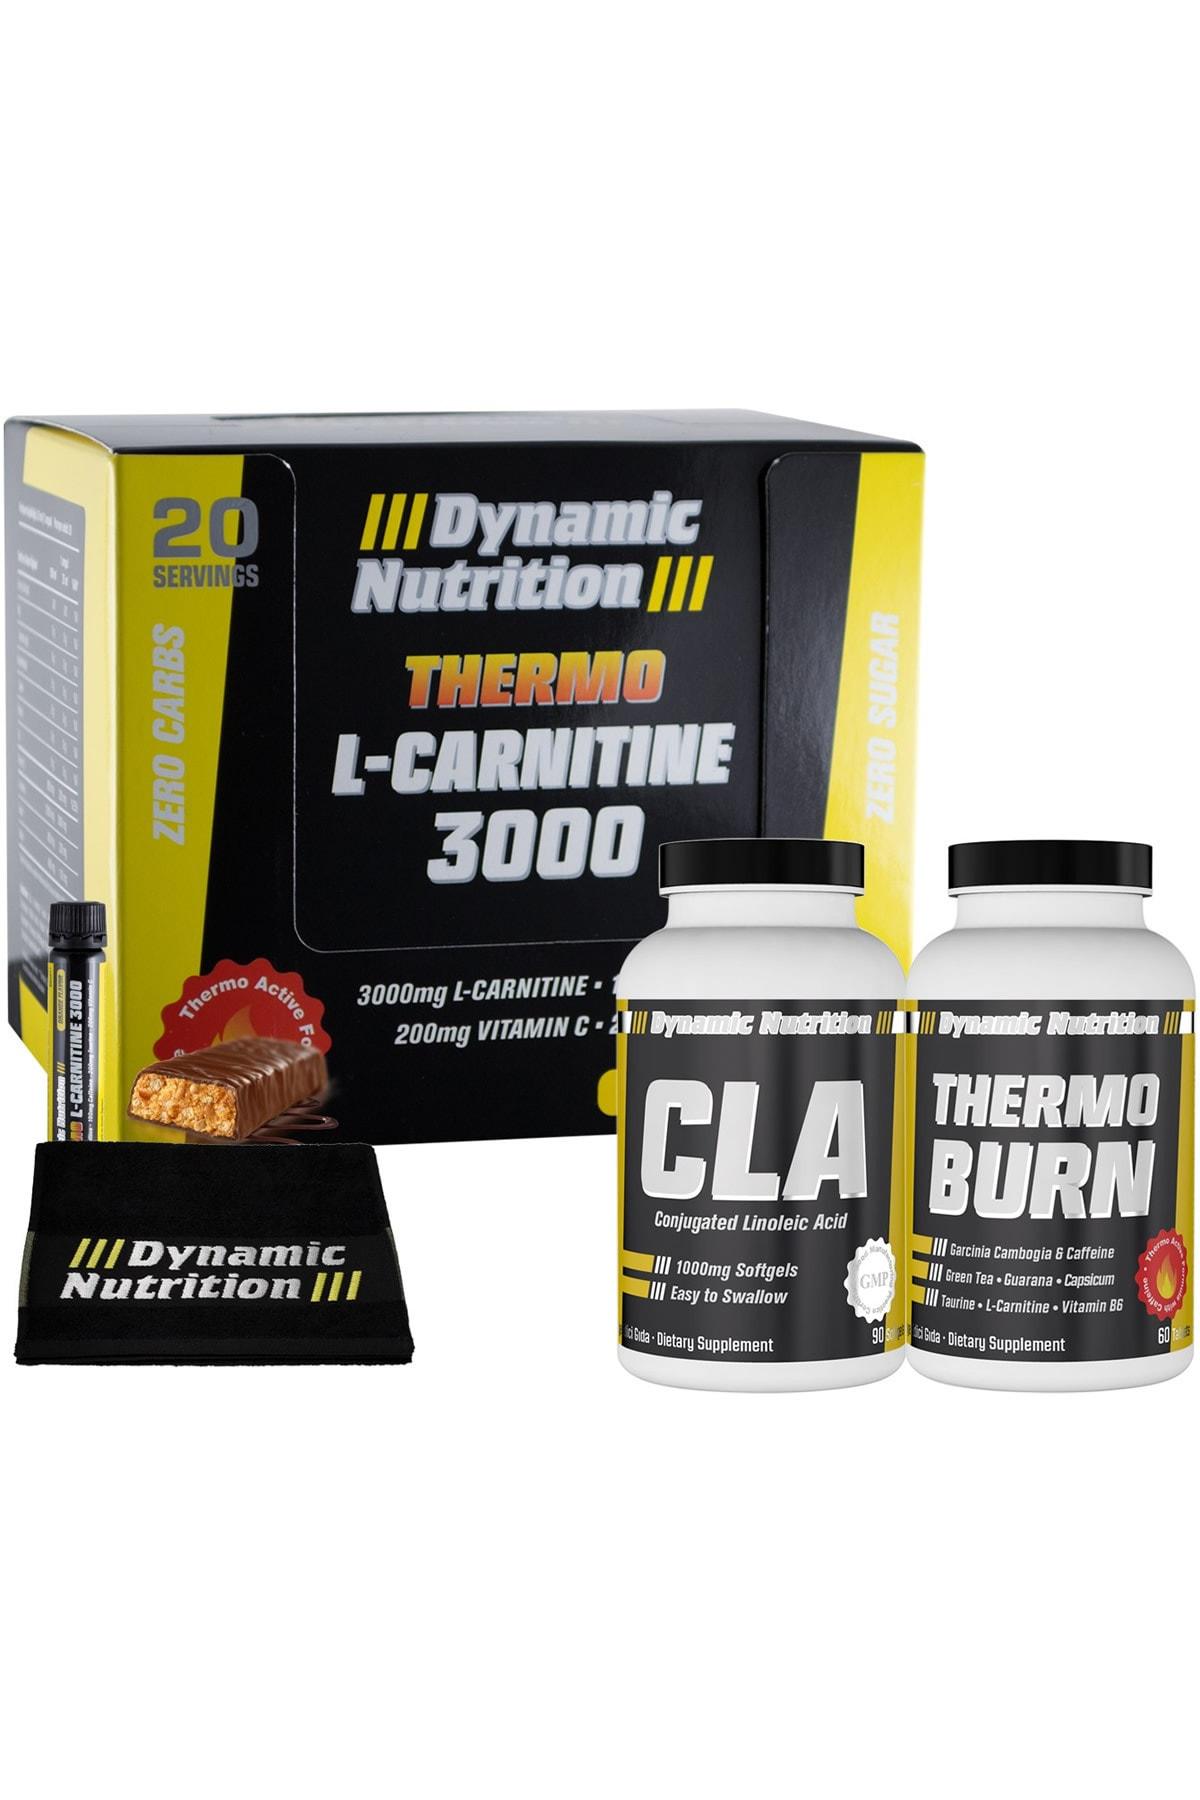 Dynamic Nutrition Dynamic Thermo L-Carnitine 3000 mg 20 Ampul + CLA 90 Kapsül + Thermo Burn 60 Tablet + 3 HEDİYE 1